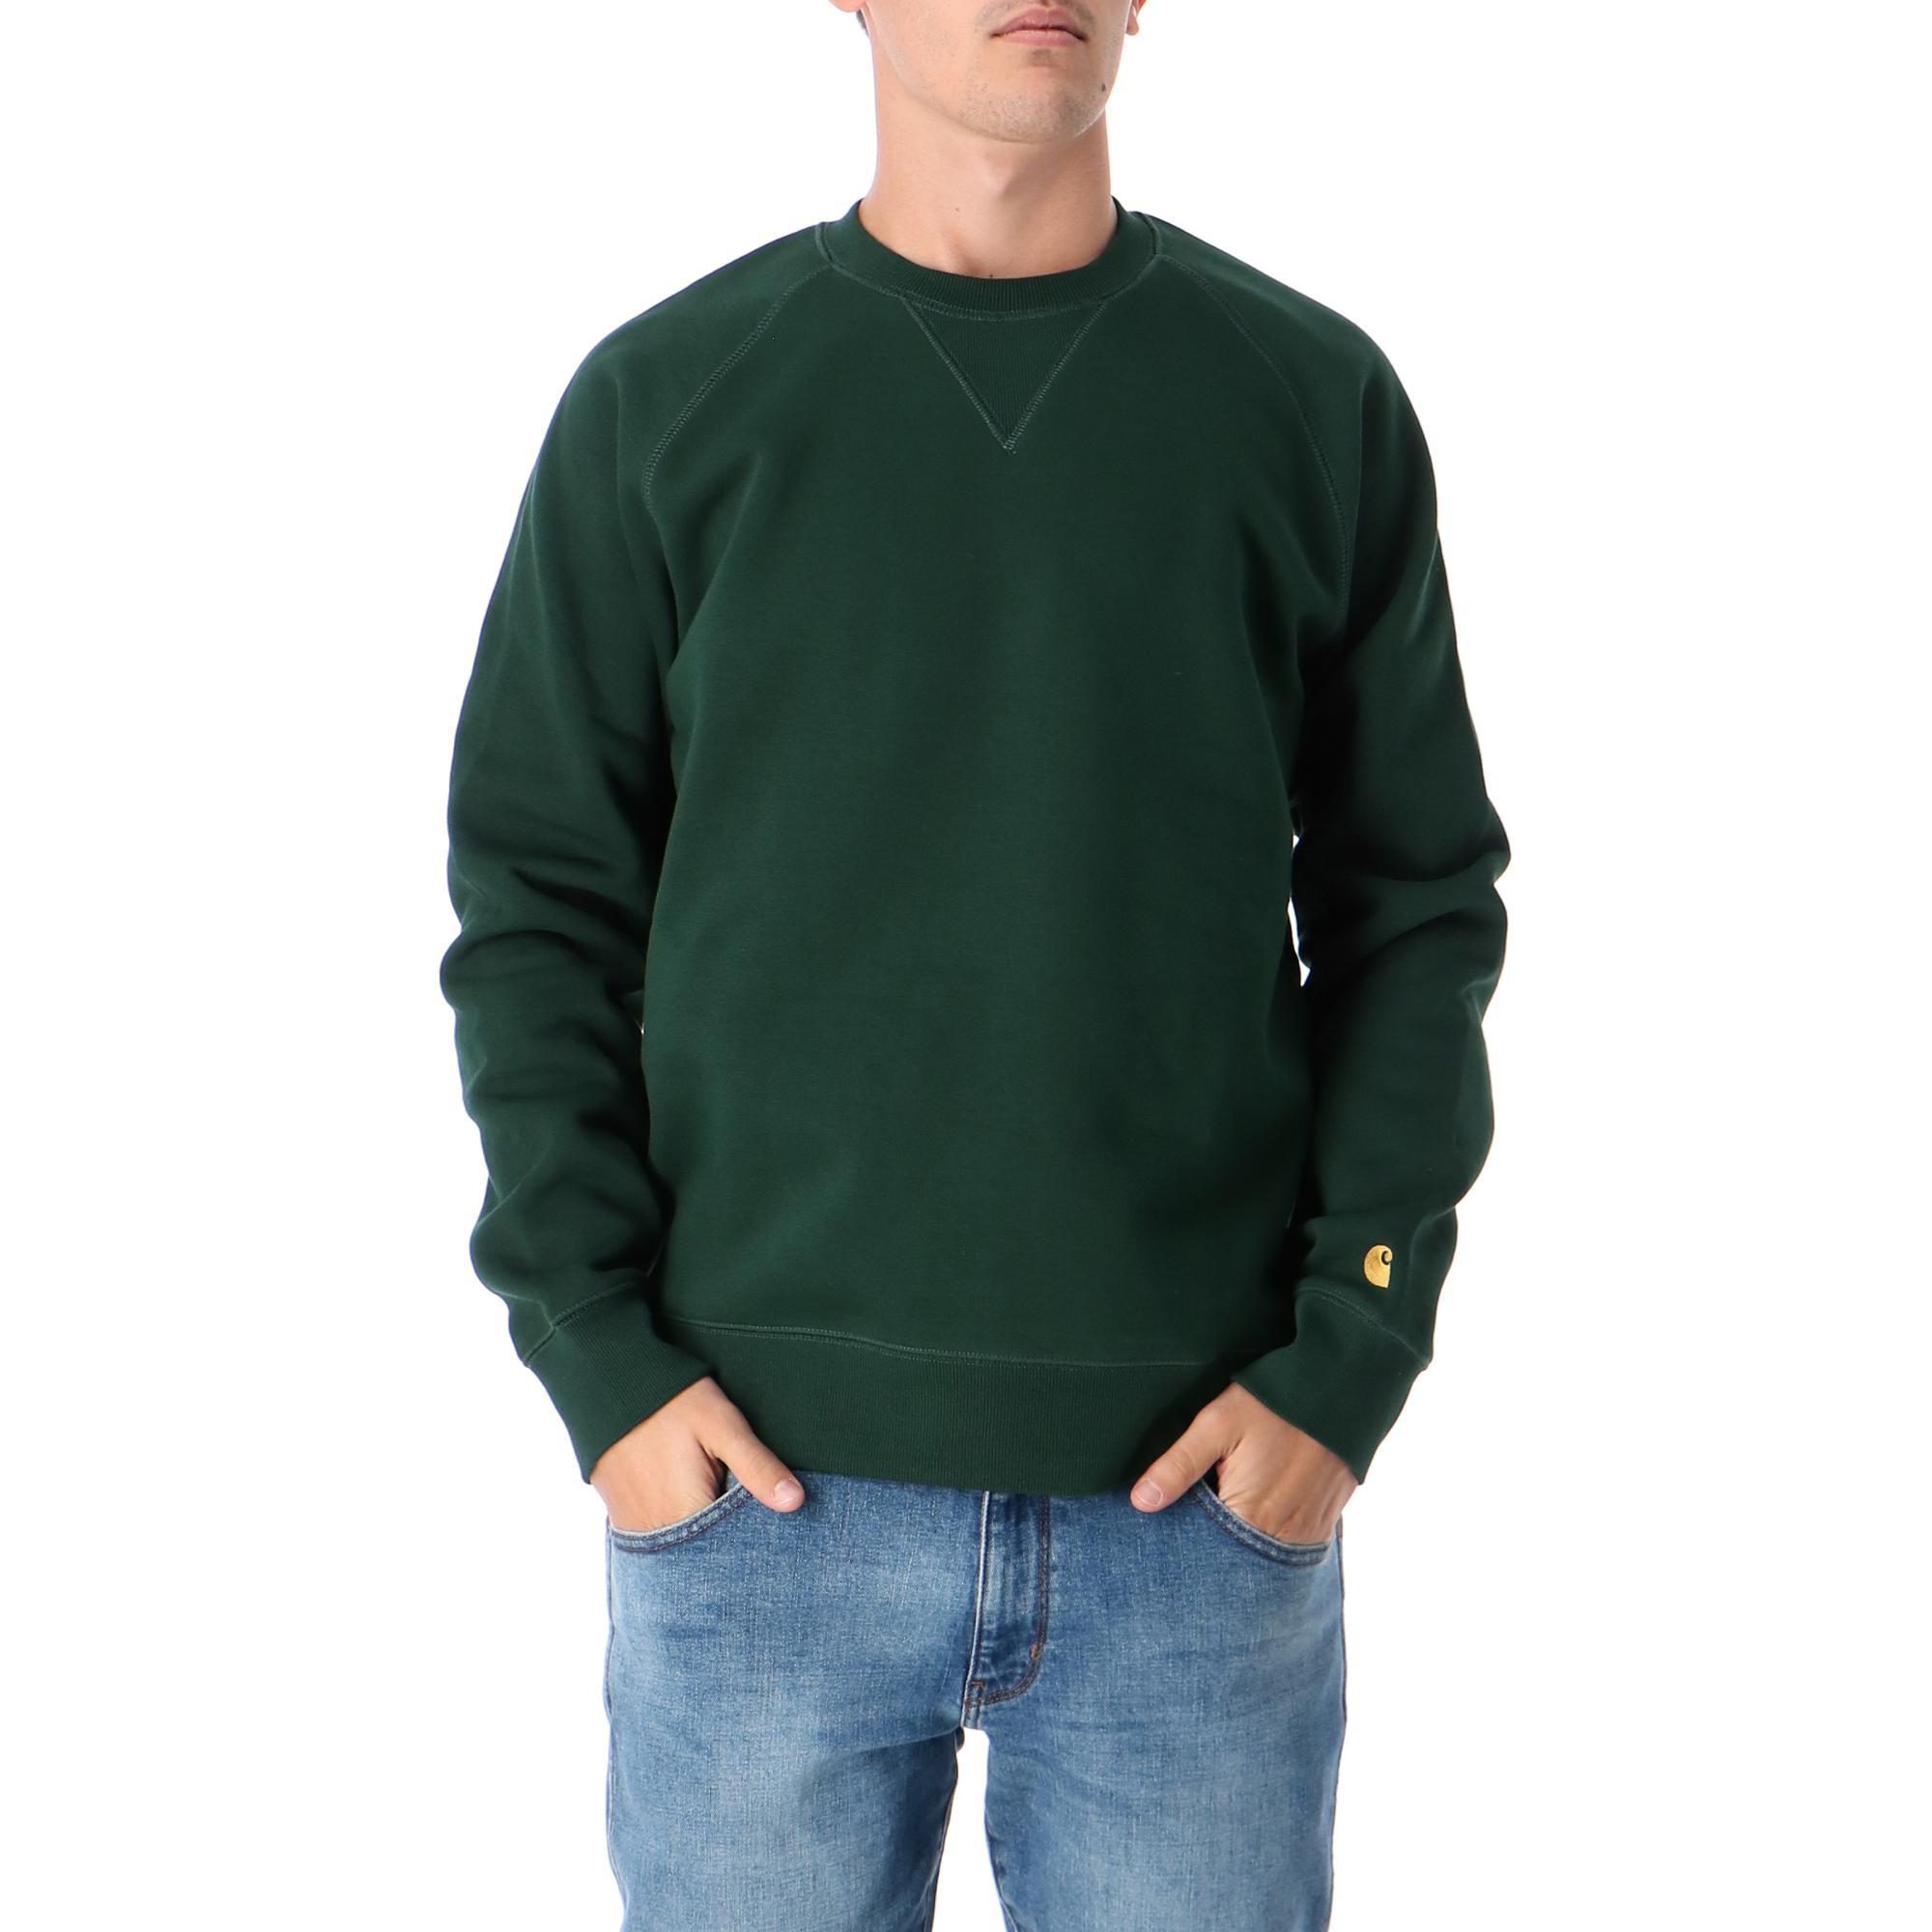 Carhartt Chase Sweatshirt Bottle green gold